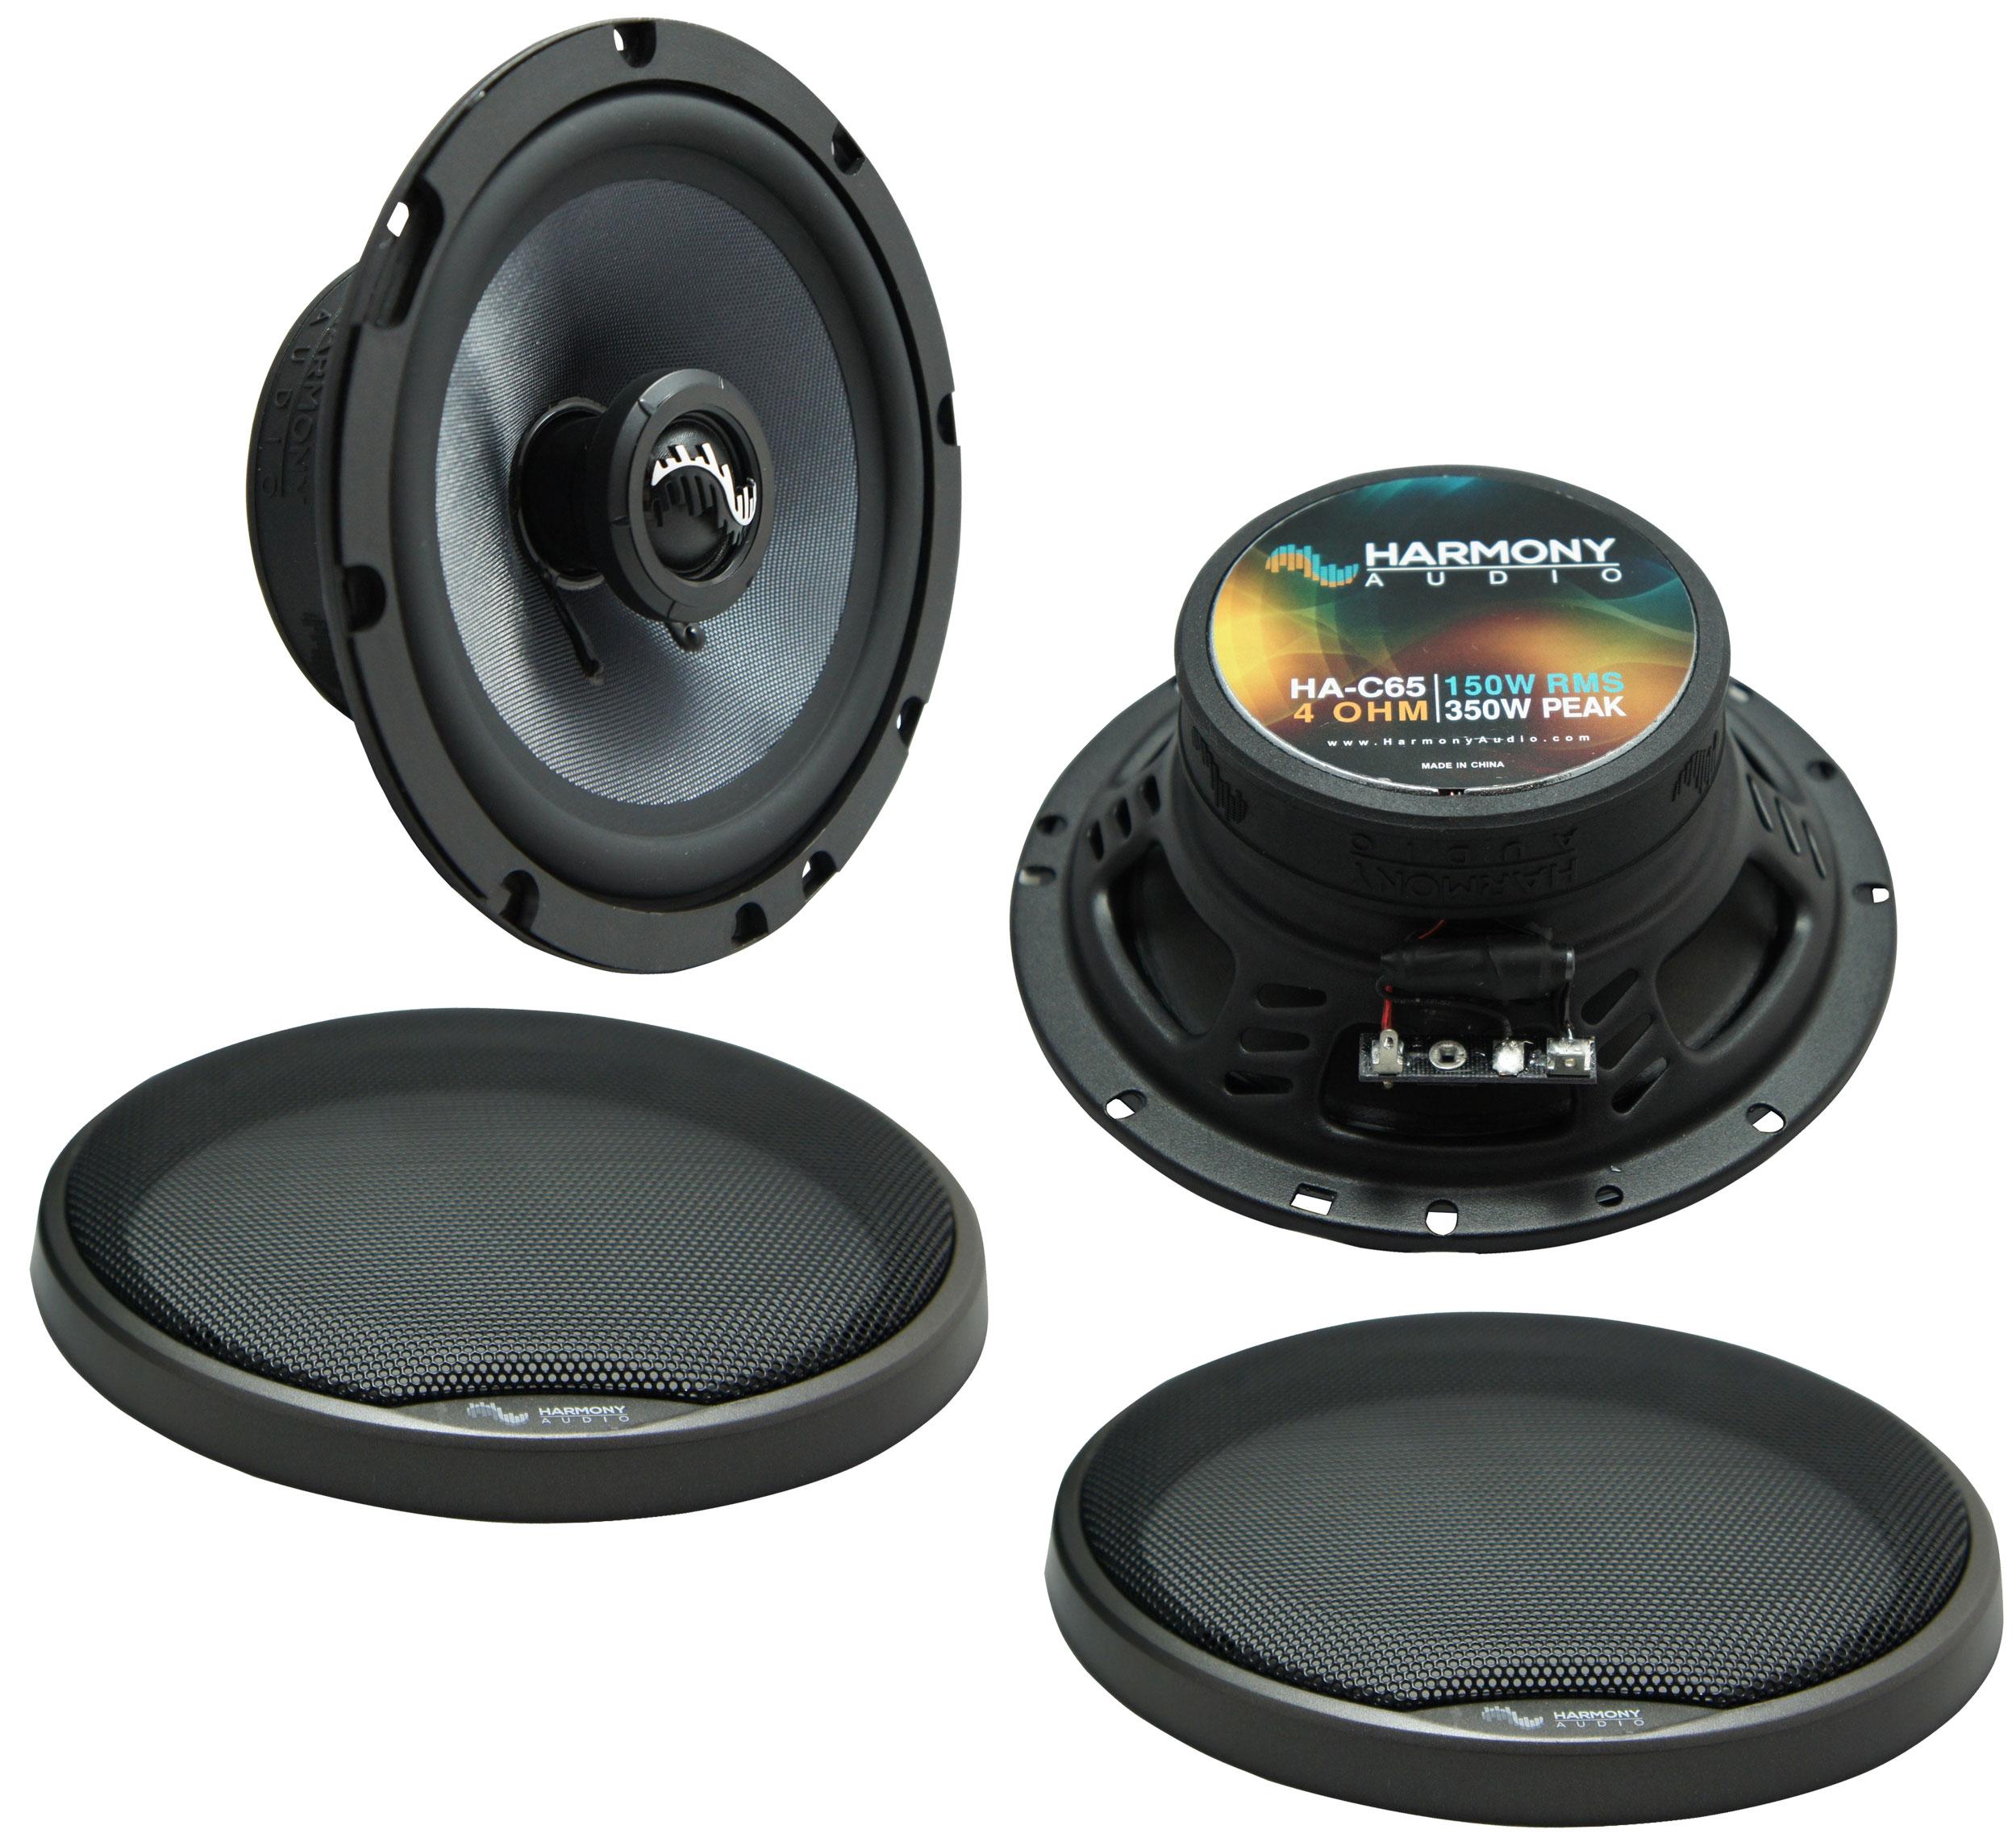 Fits Acura NSX 1994-2005 Rear Deck Replacement Speaker Harmony HA-C65 Premium Speakers